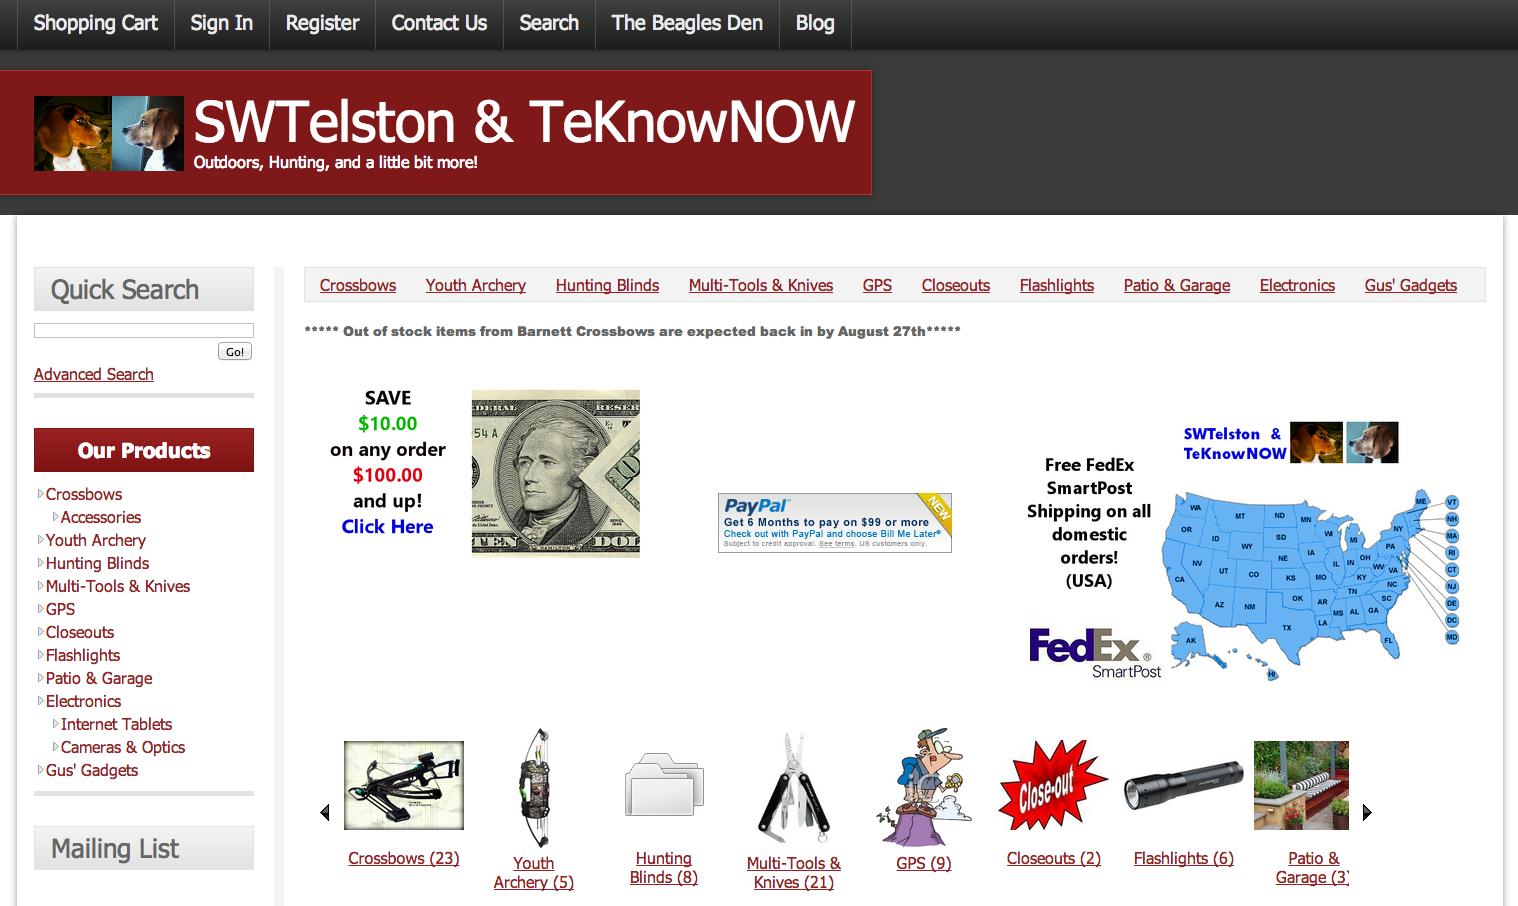 Teknownow.com